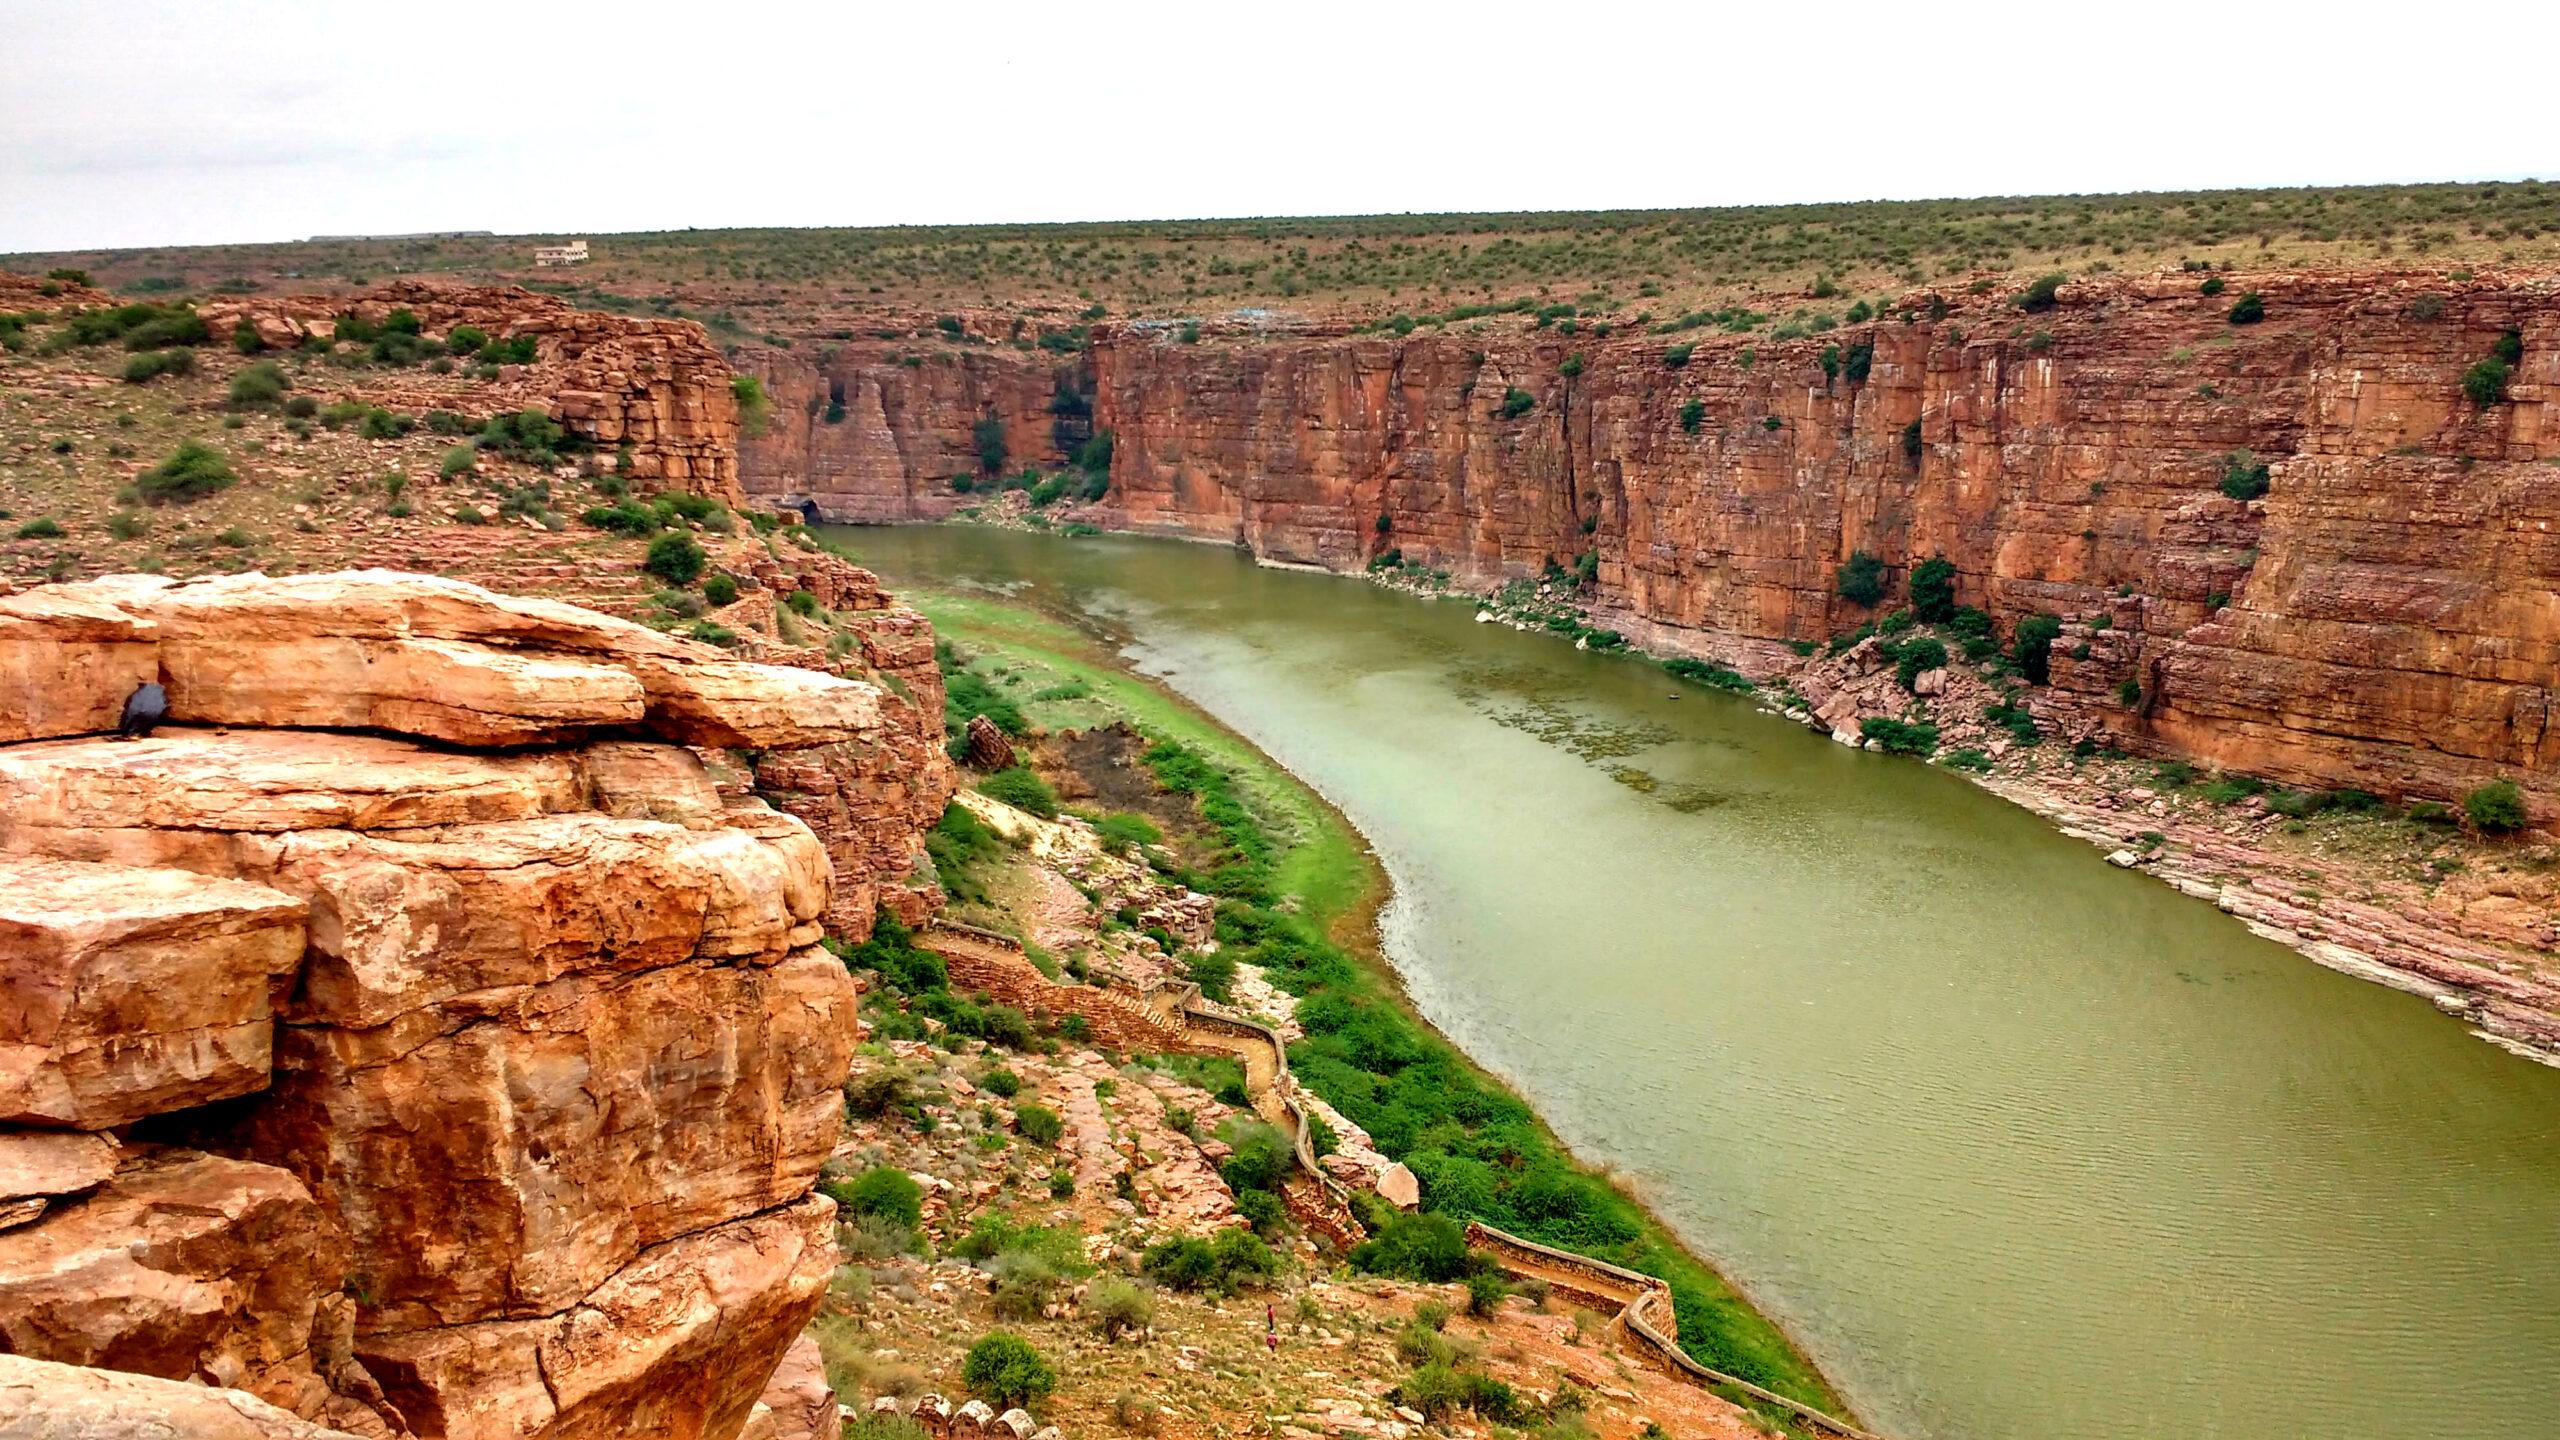 Gandikota: The Grand Canyon of India